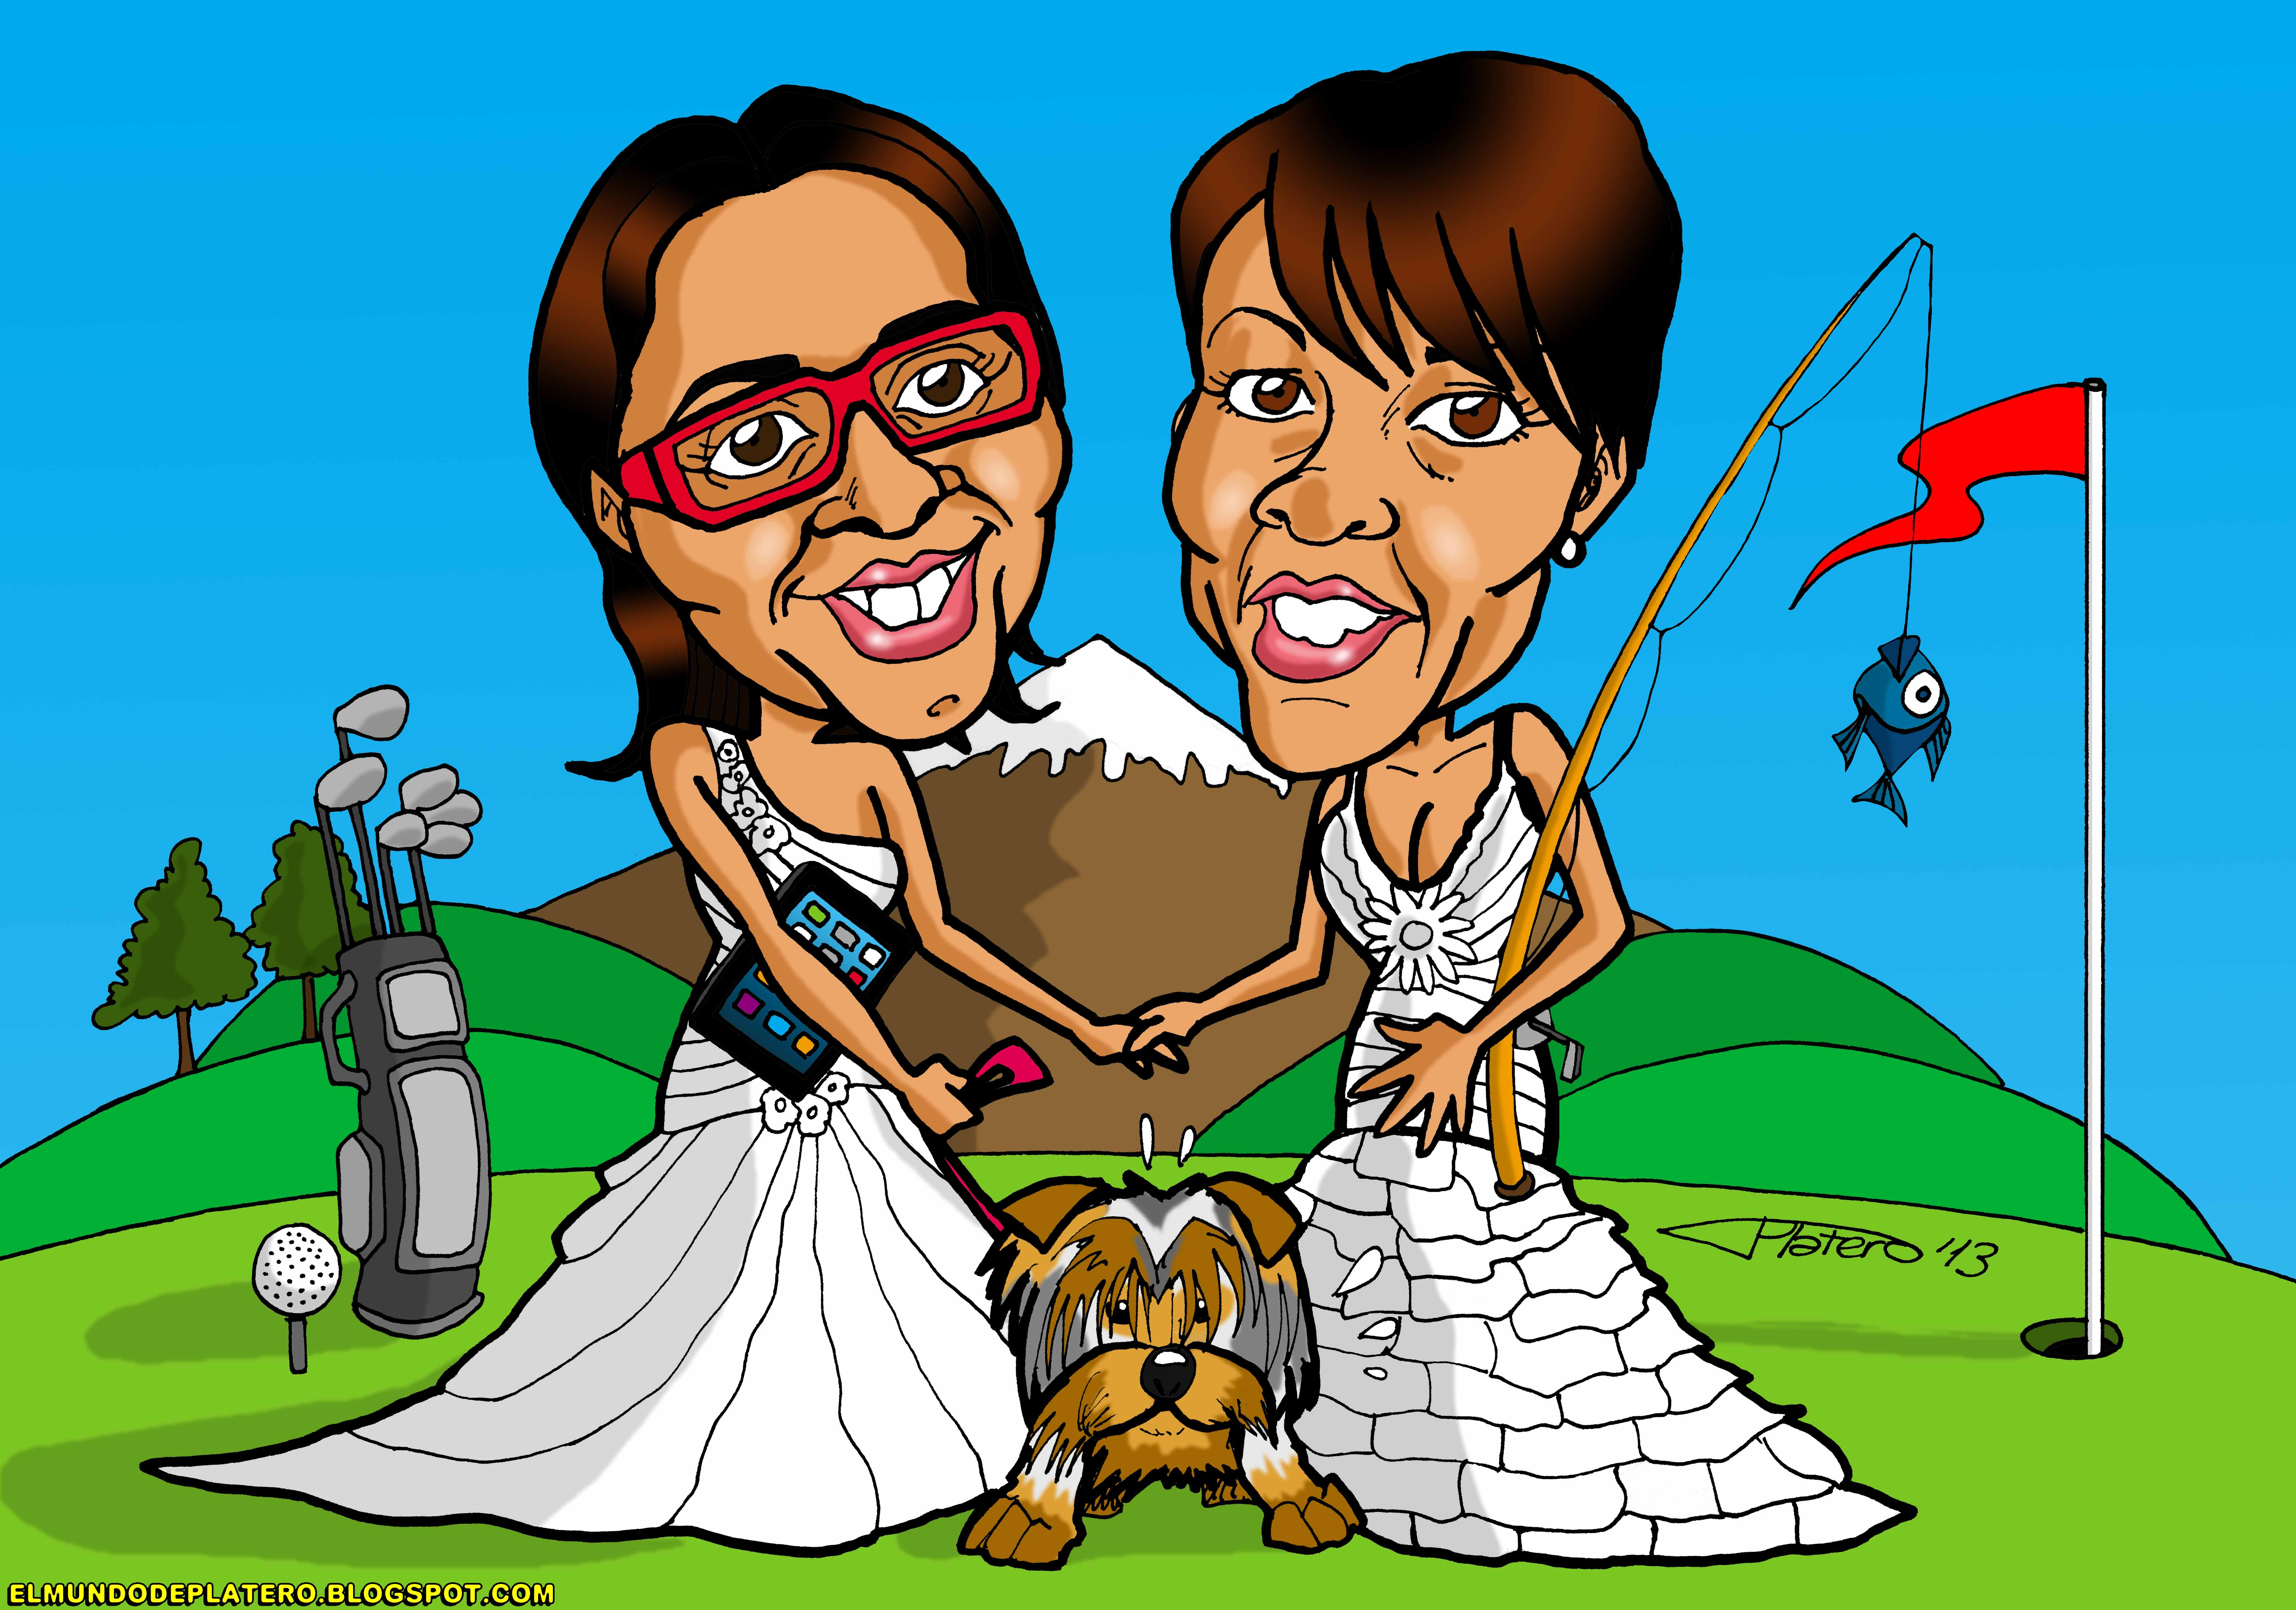 caricaturas a color por encargo personalizadas_novias_invitación boda_elmundodep